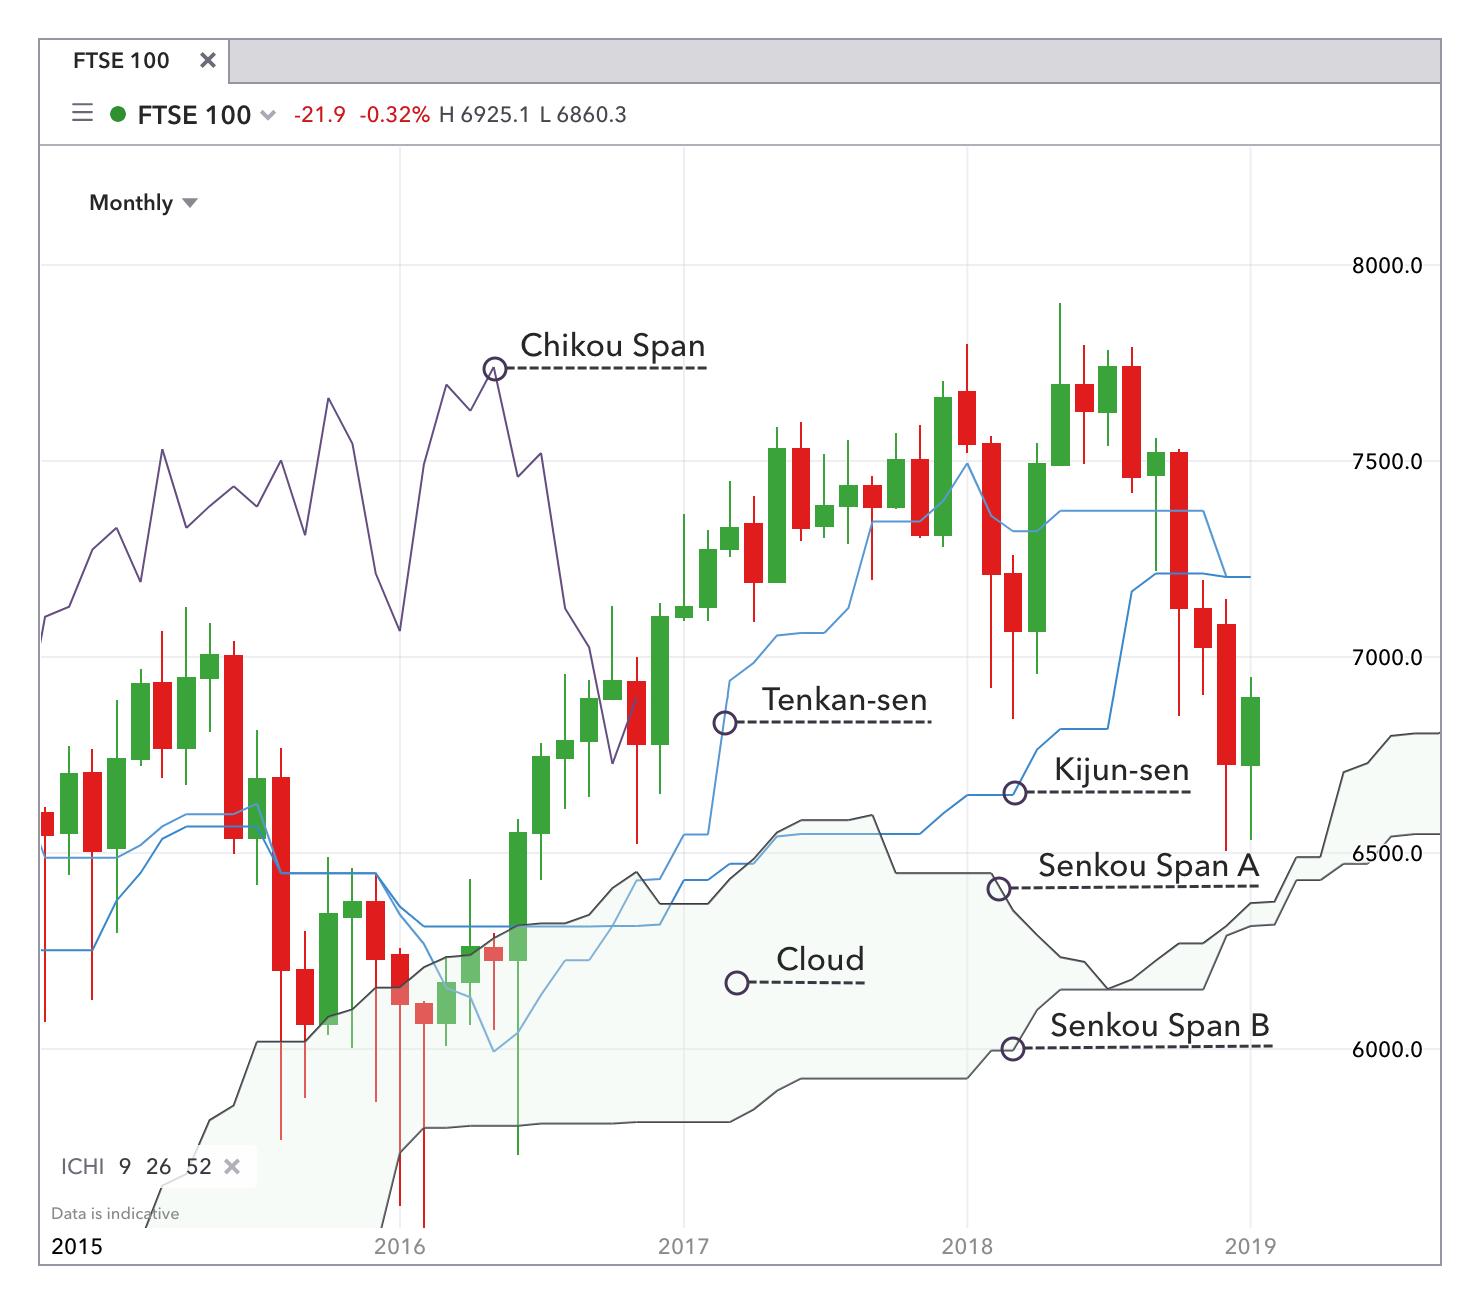 Advanced candlesticks and ichimoku strategies for forex trading semi dedicados para mutual betting